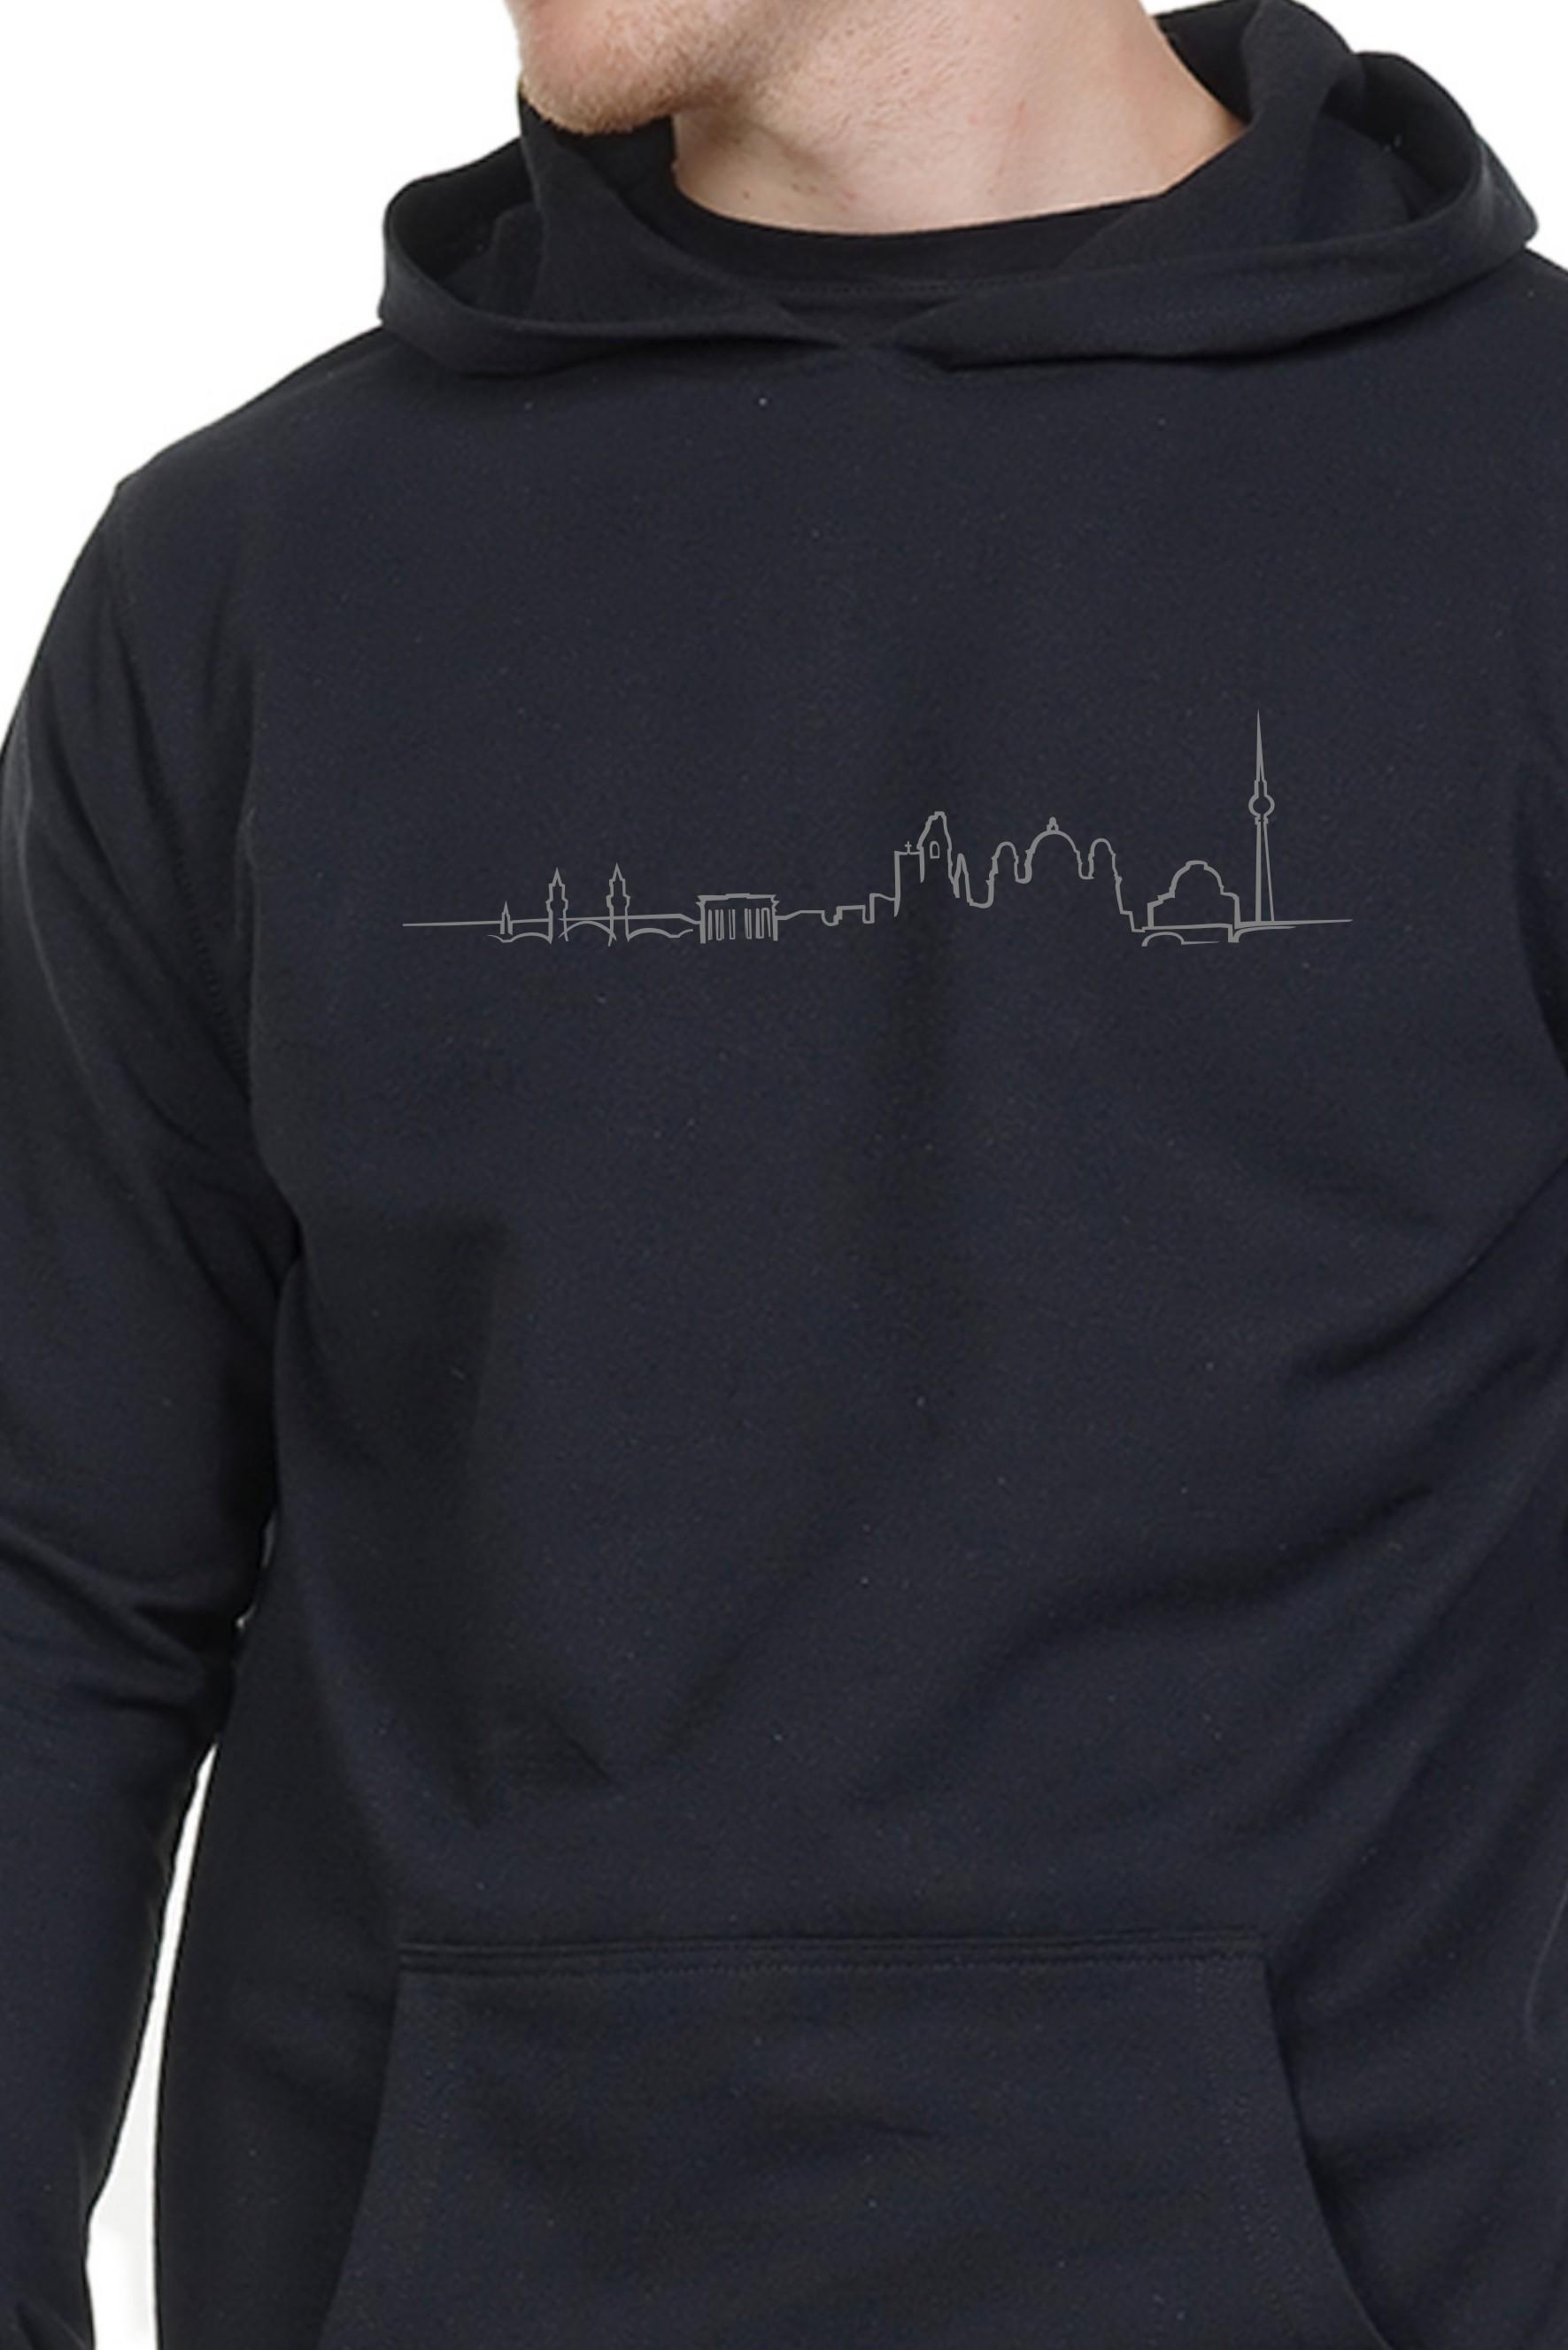 Spree Hoodie Herren Berlin Skyline